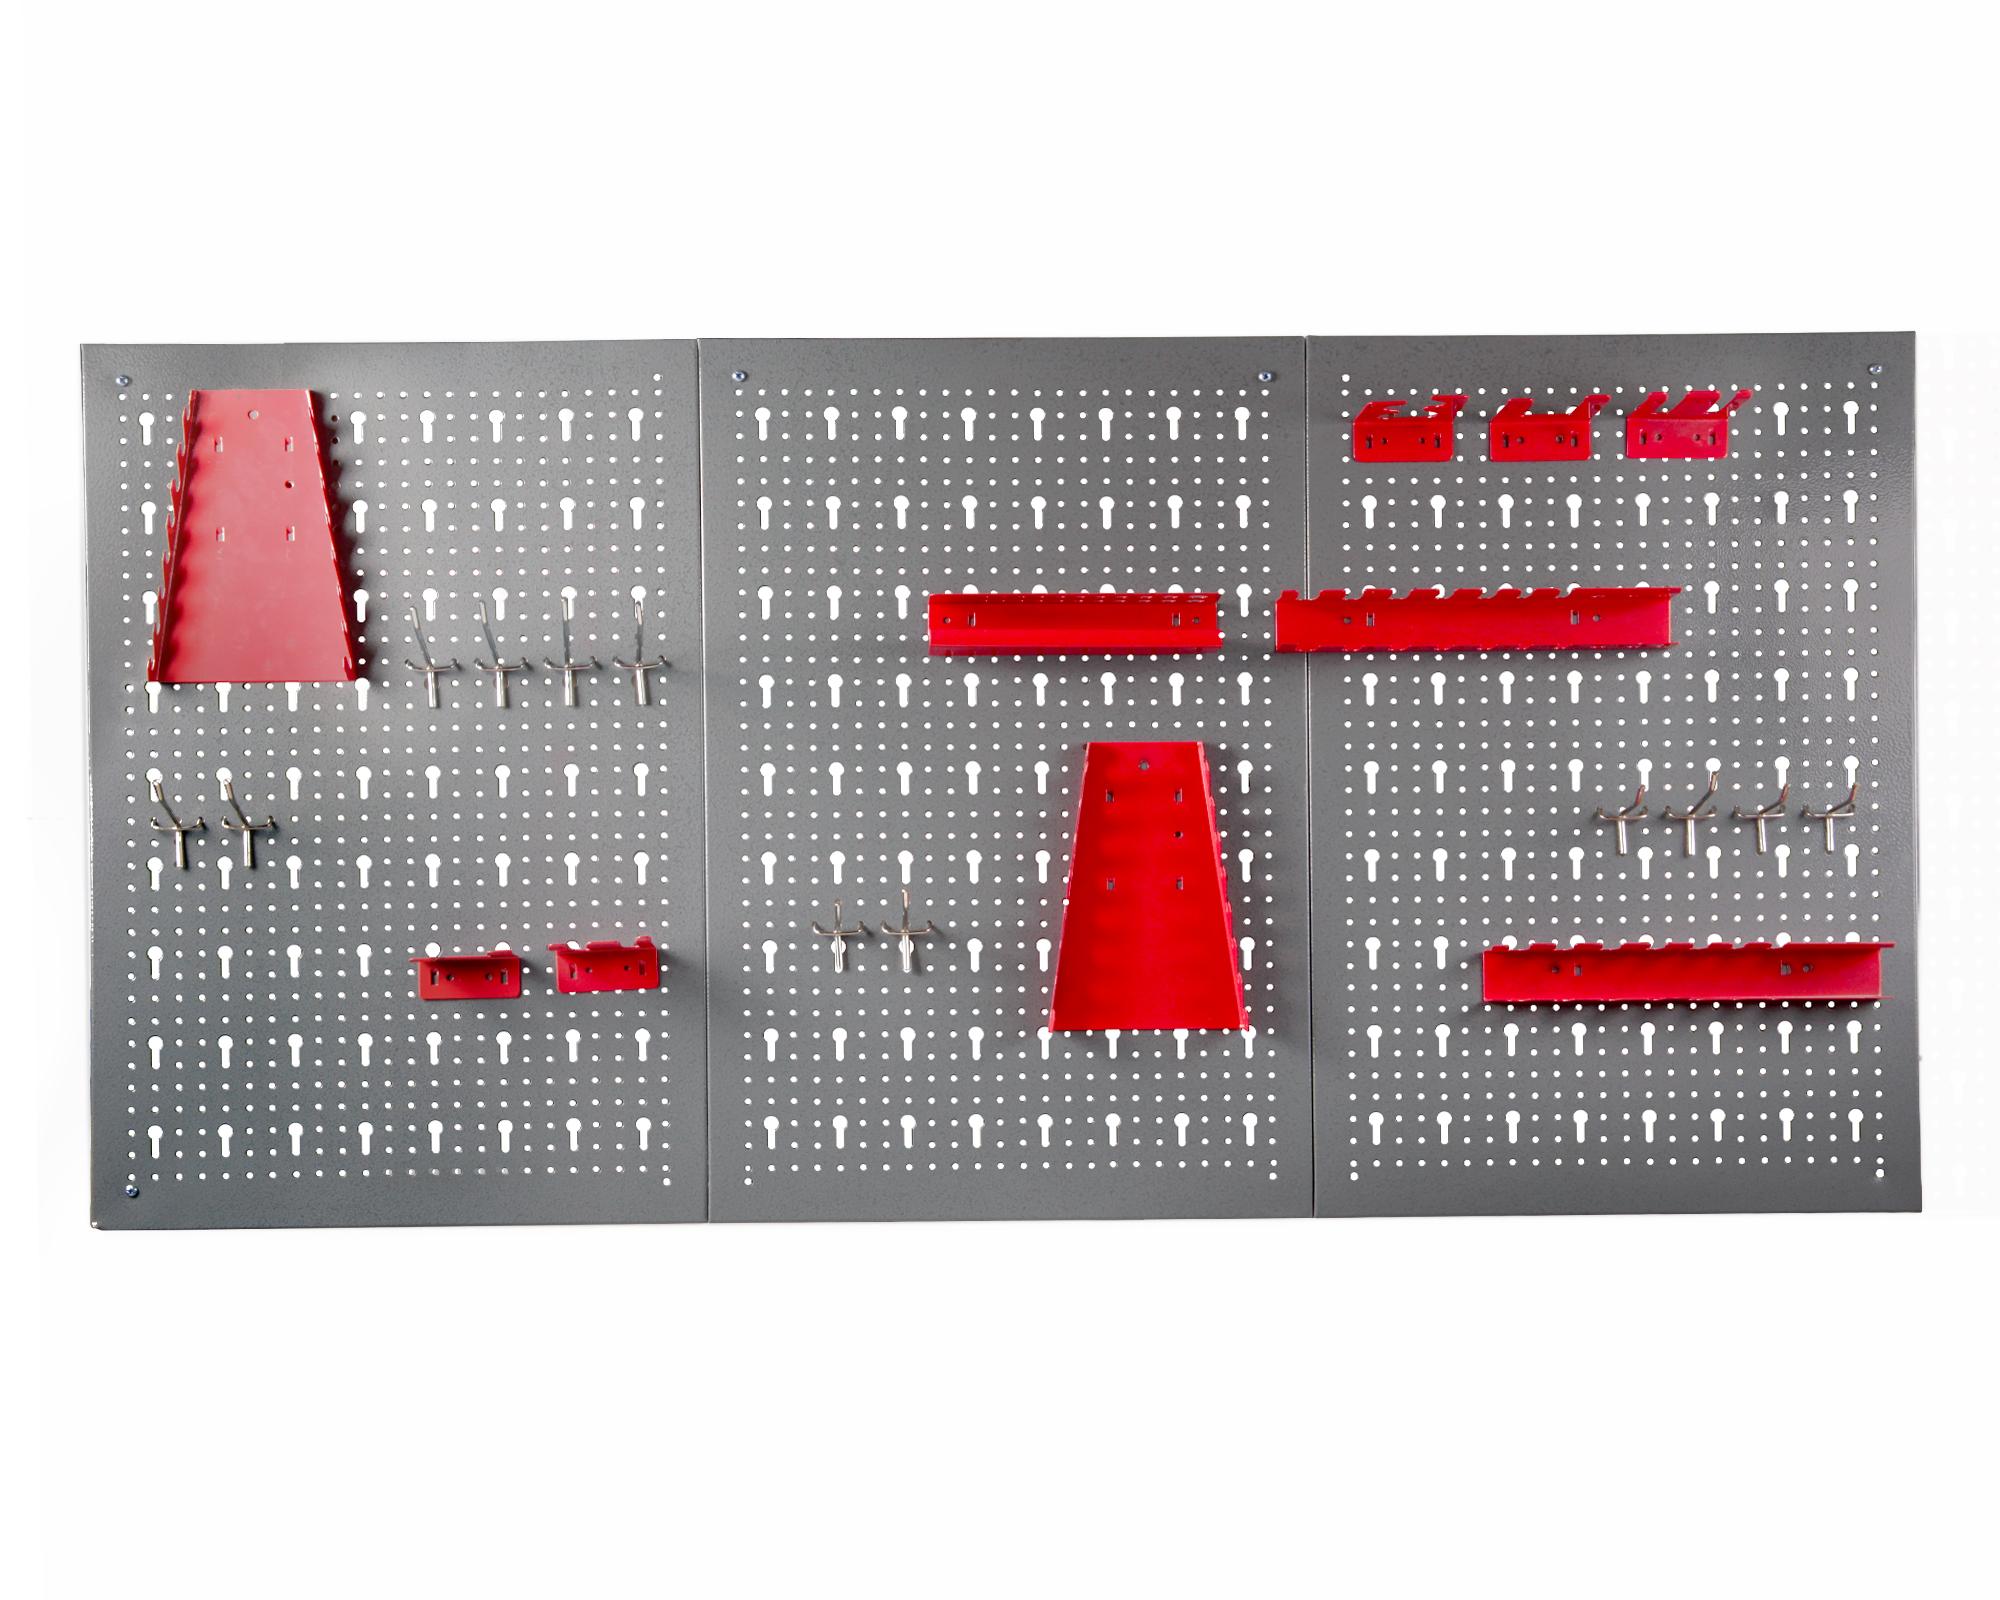 ondis24.com | Werkzeugwand Lochwand mit Hakensortiment aus Metall, rot